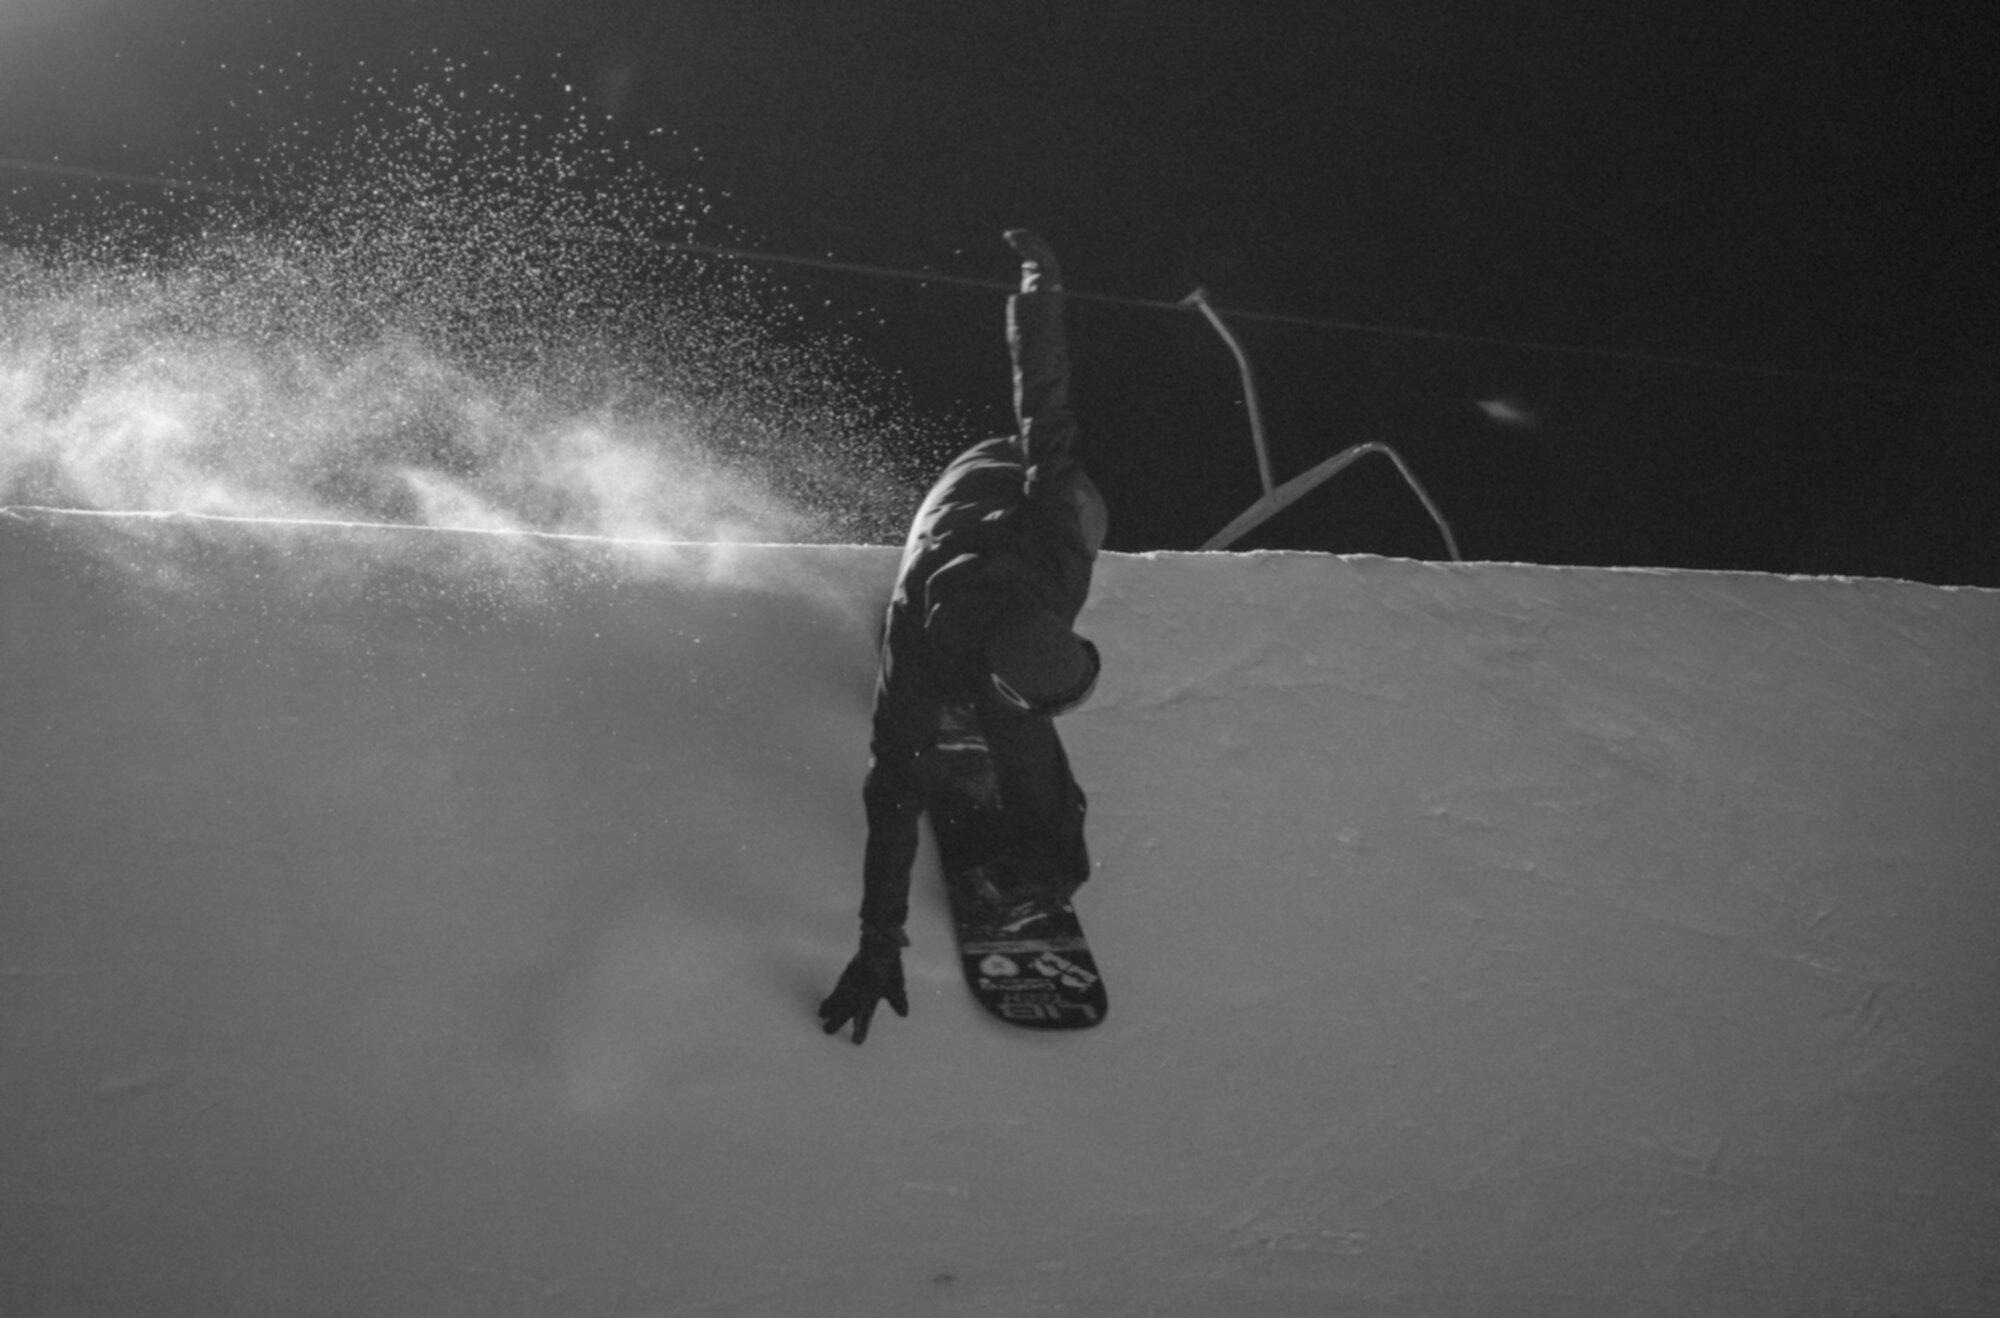 snowboarder on halfpipe